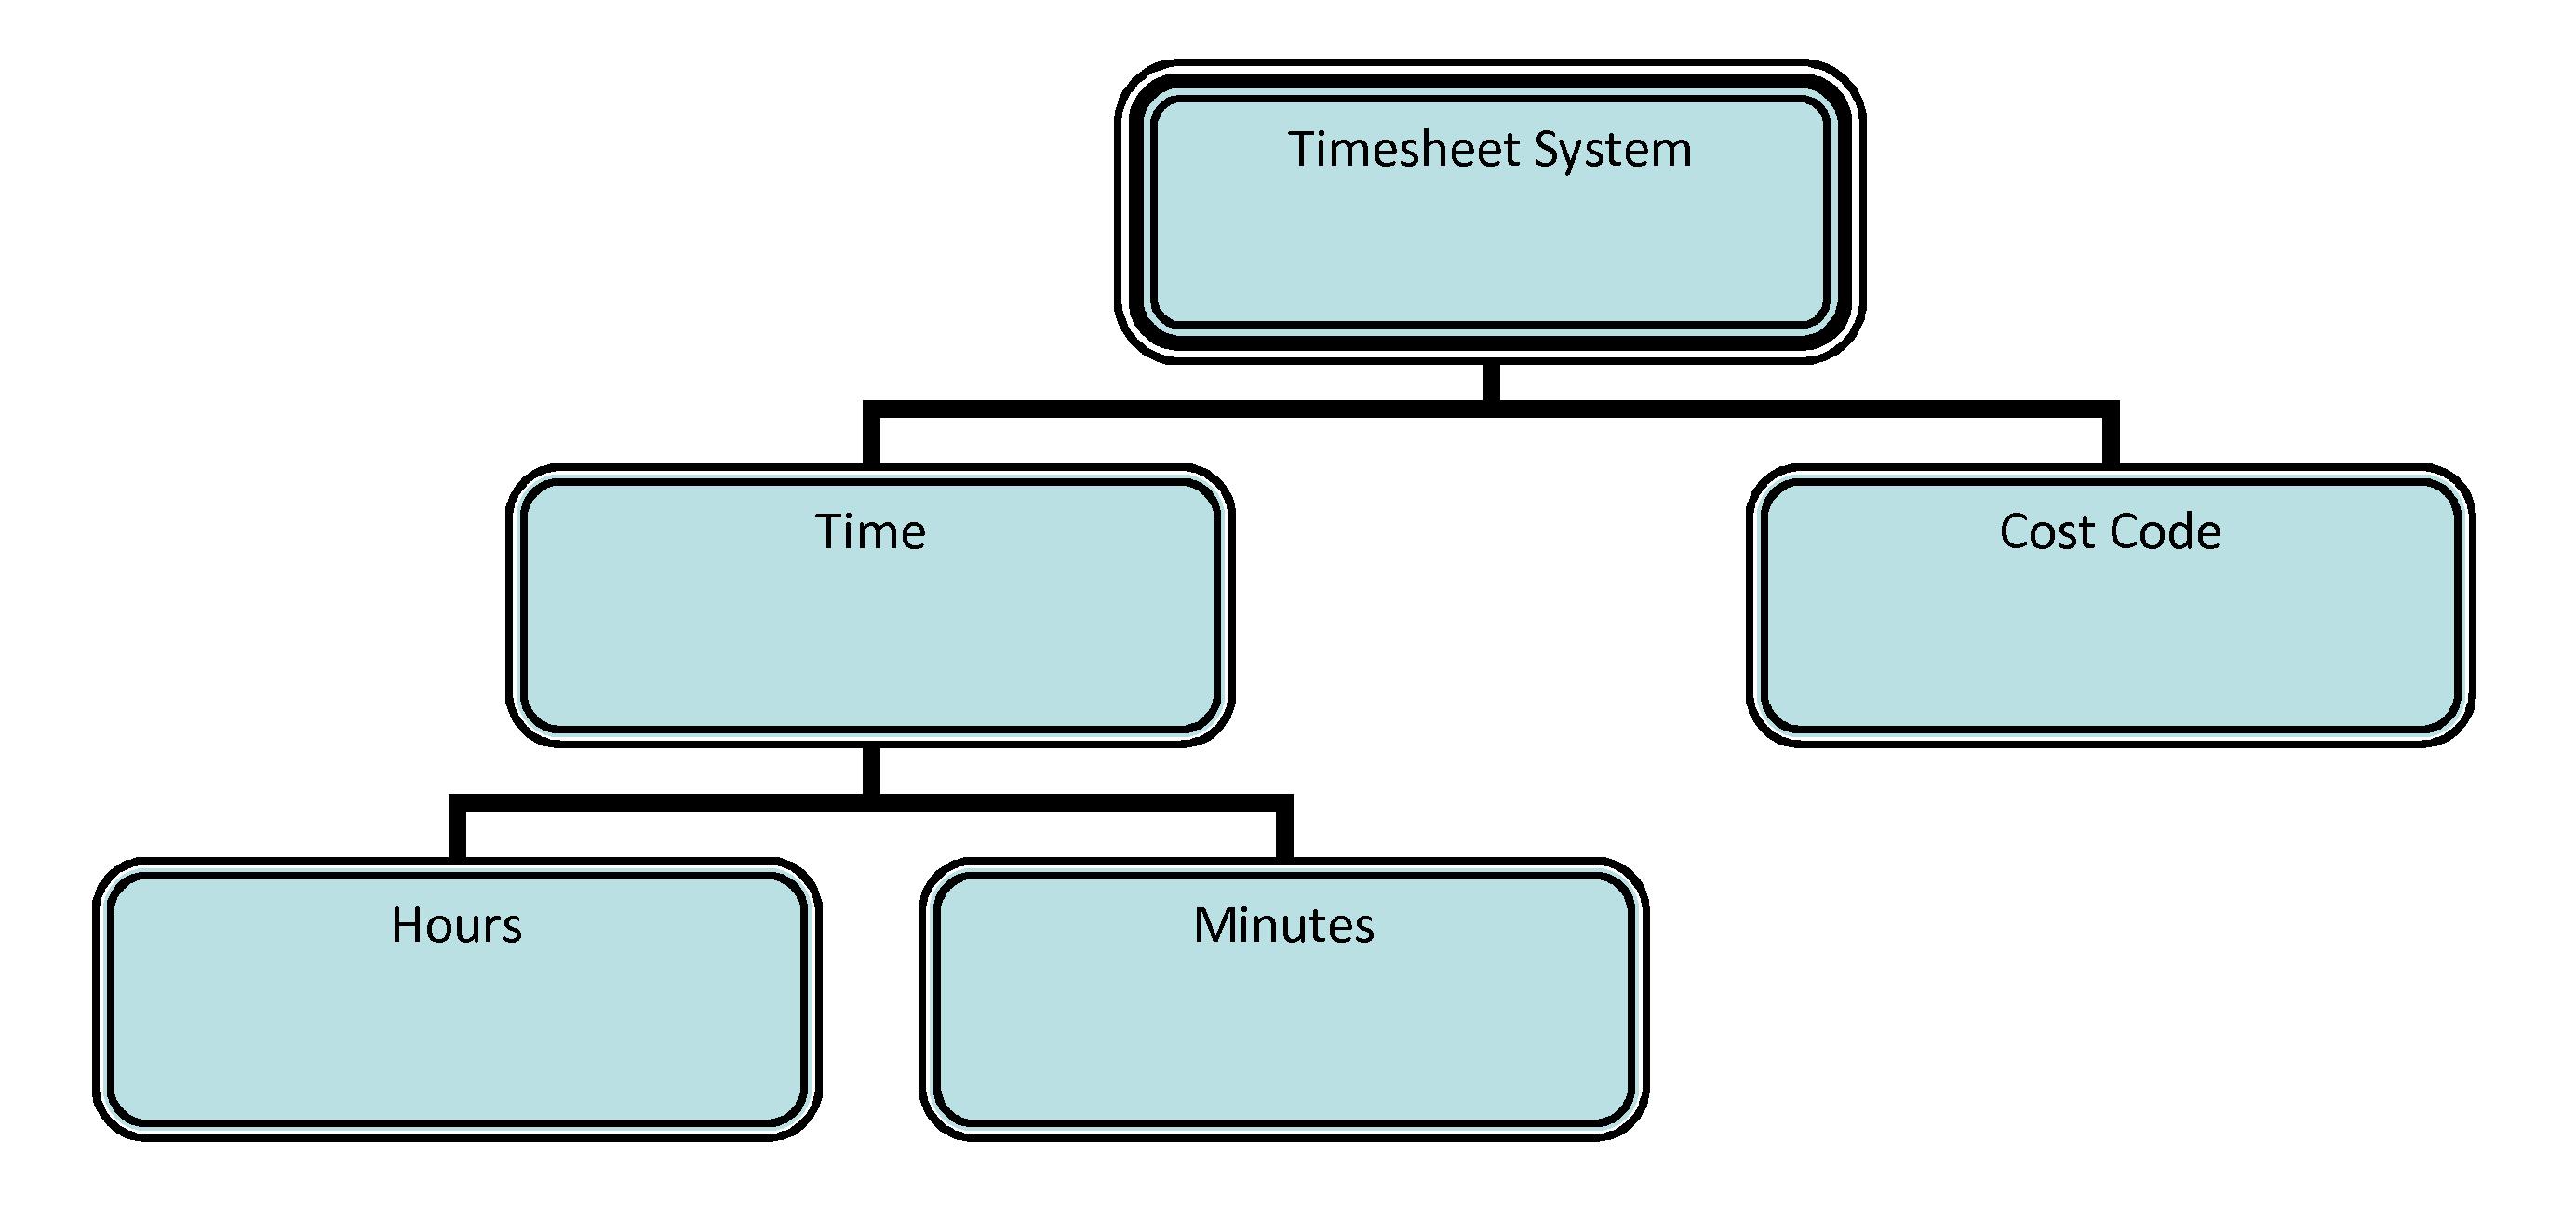 boundary value analysis in testing pdf